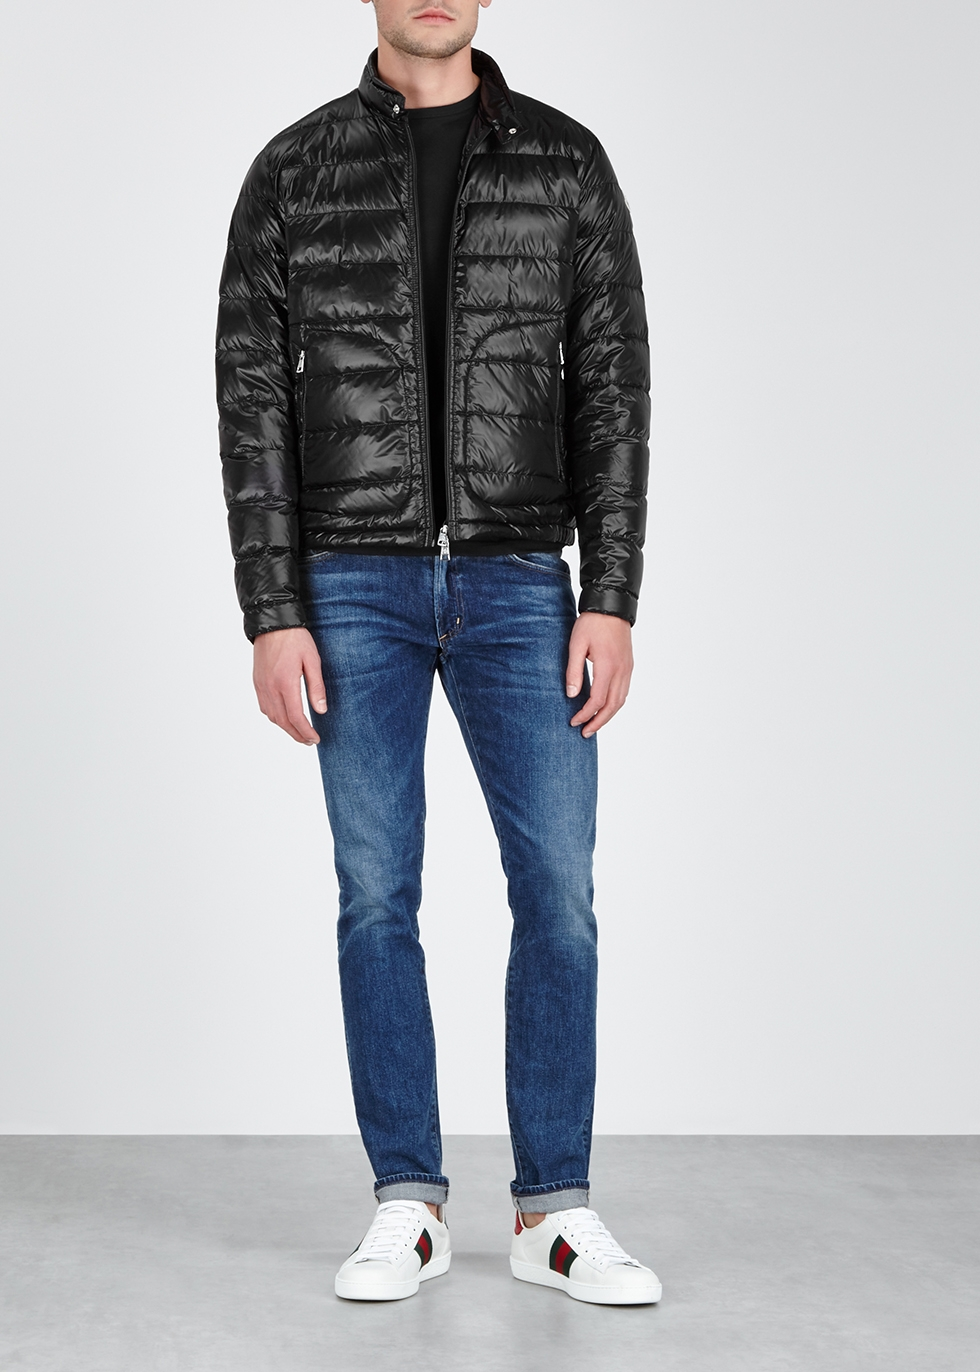 0534aa8c21b6 Moncler - Designer Jackets